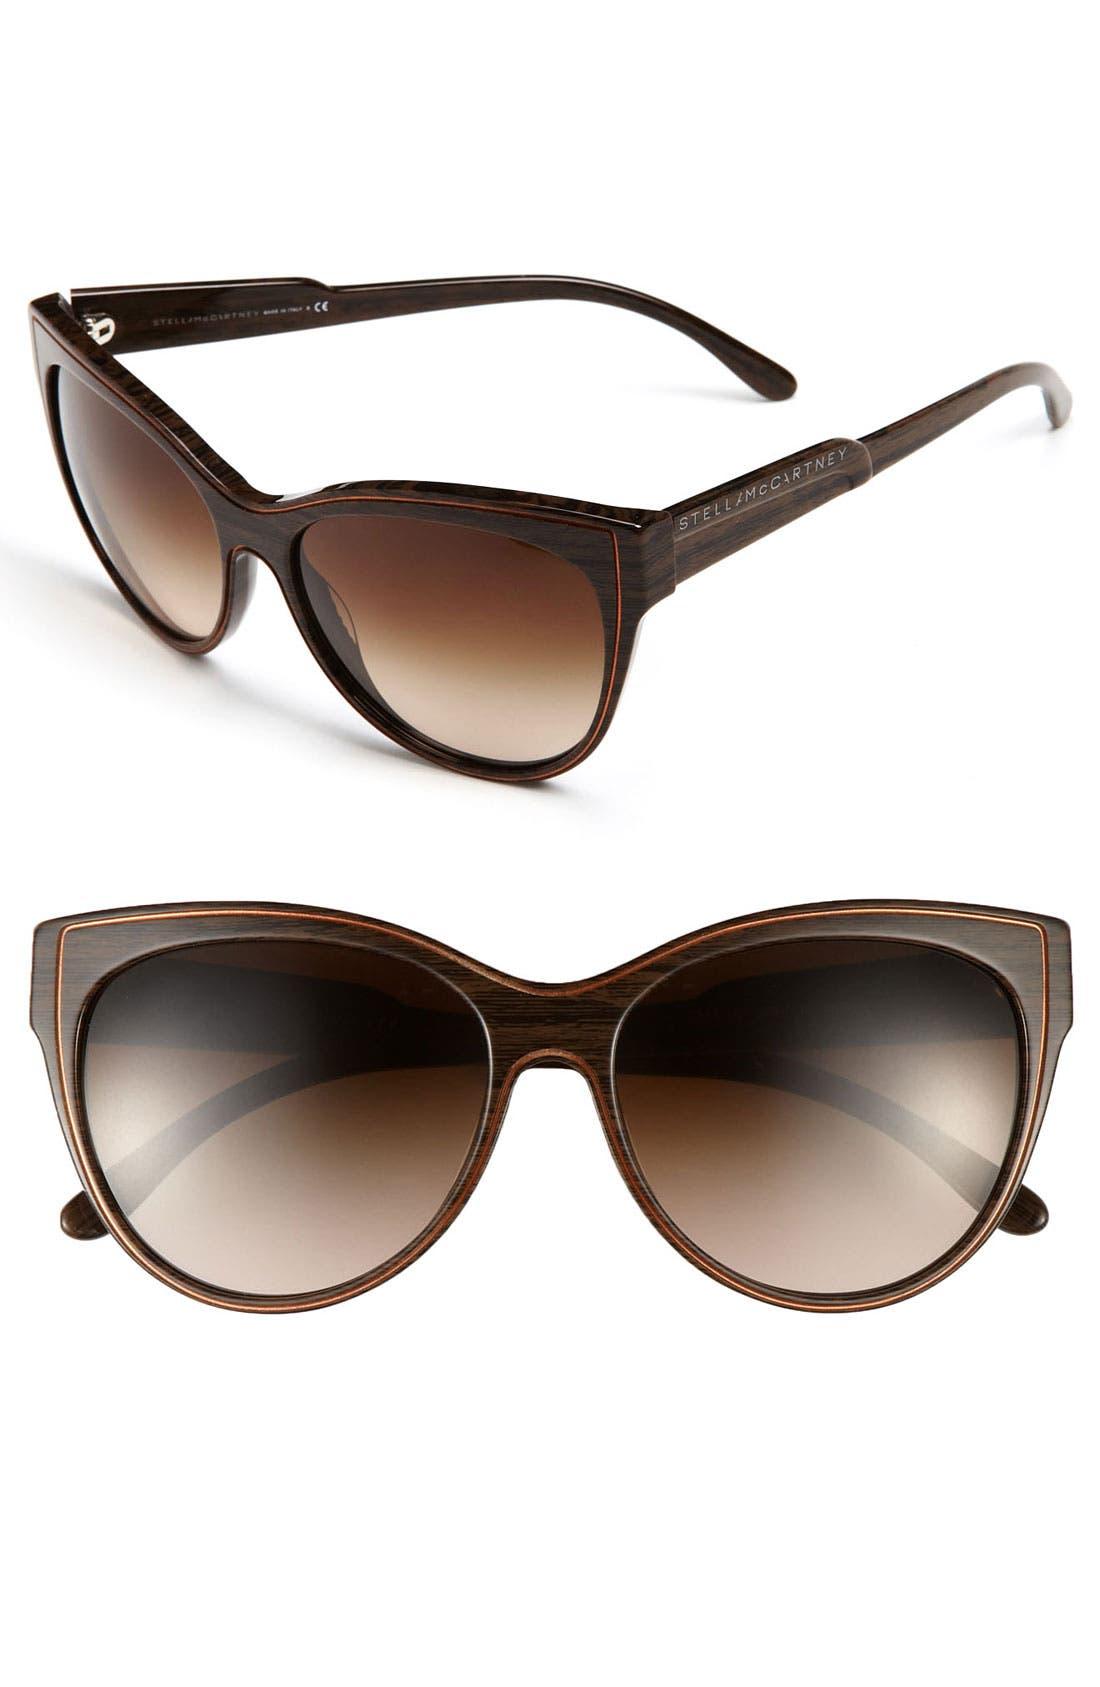 Main Image - Stella McCartney 44mm Retro Cat's Eye Sunglasses